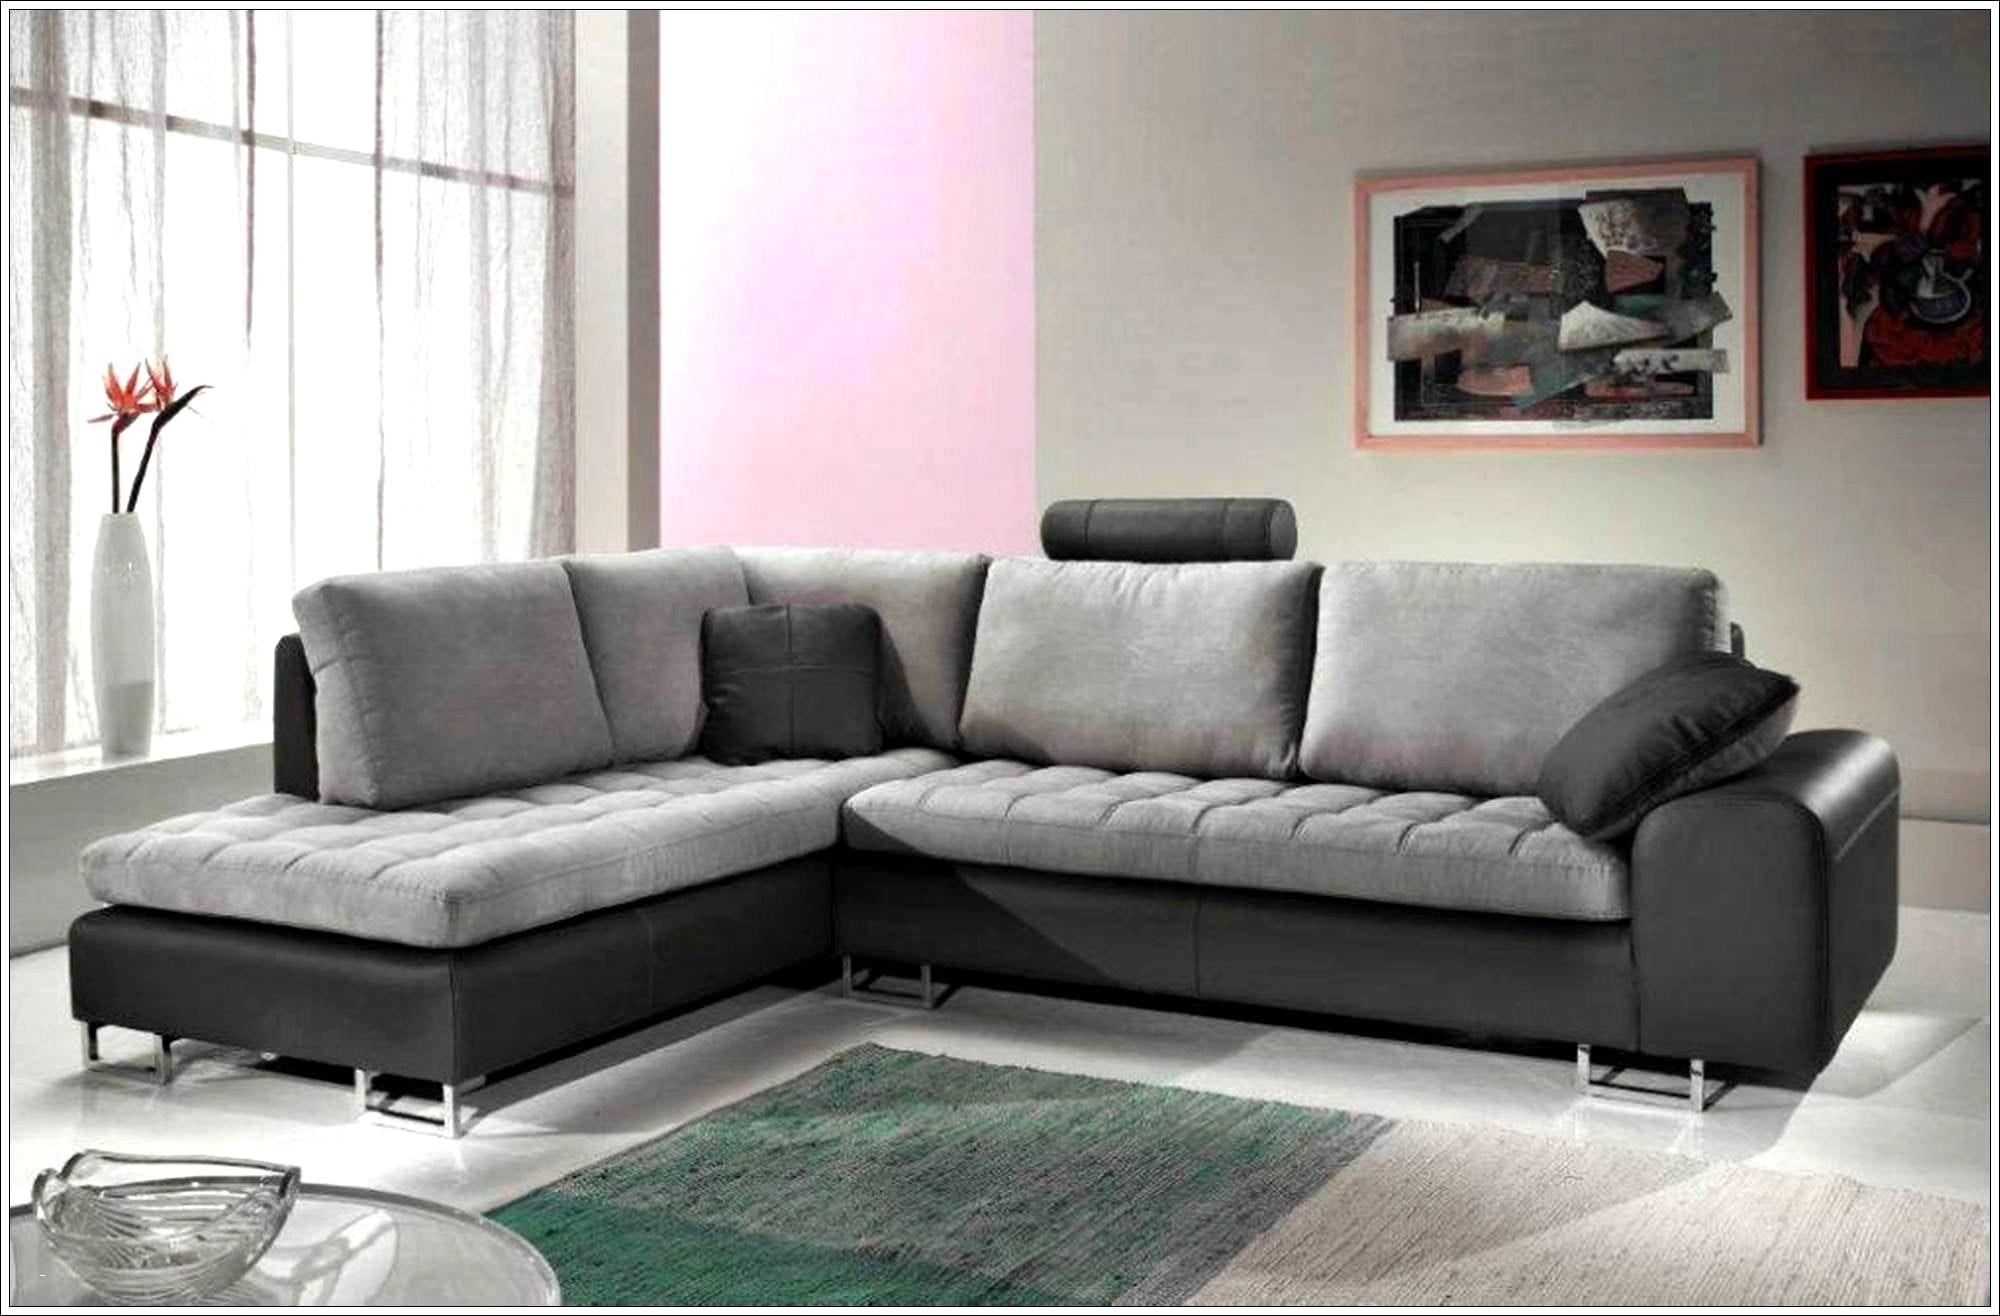 Canapé aspect Cuir Vieilli Inspirant Photos 27 Beau Canapé En Cuir Design Design De Maison